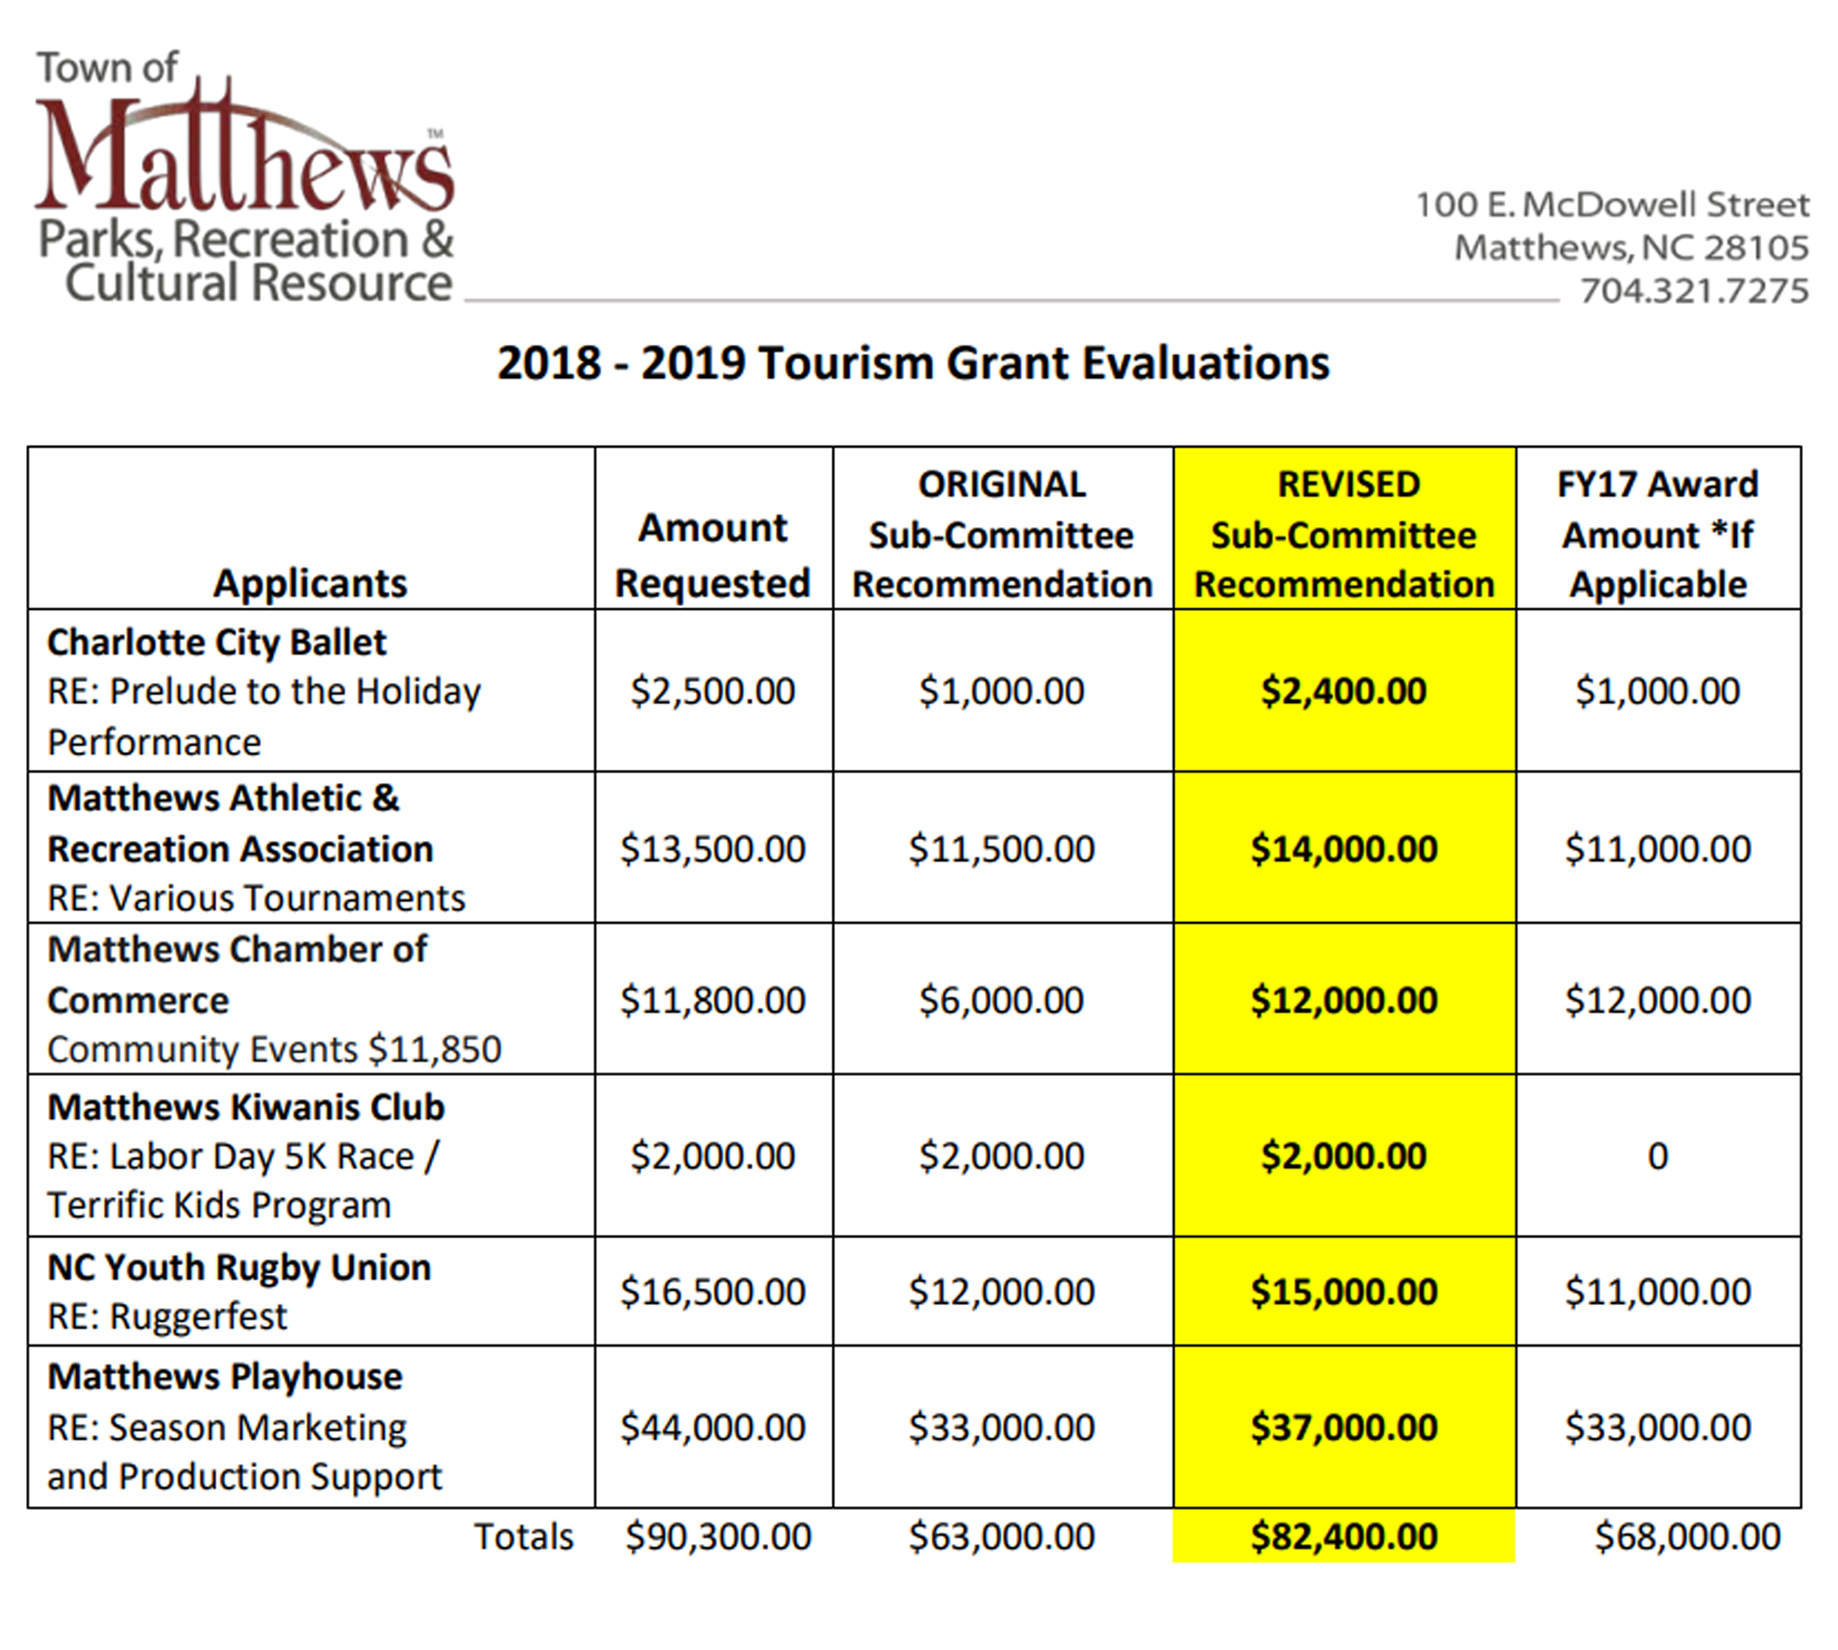 tourism grant eval 2019.jpg